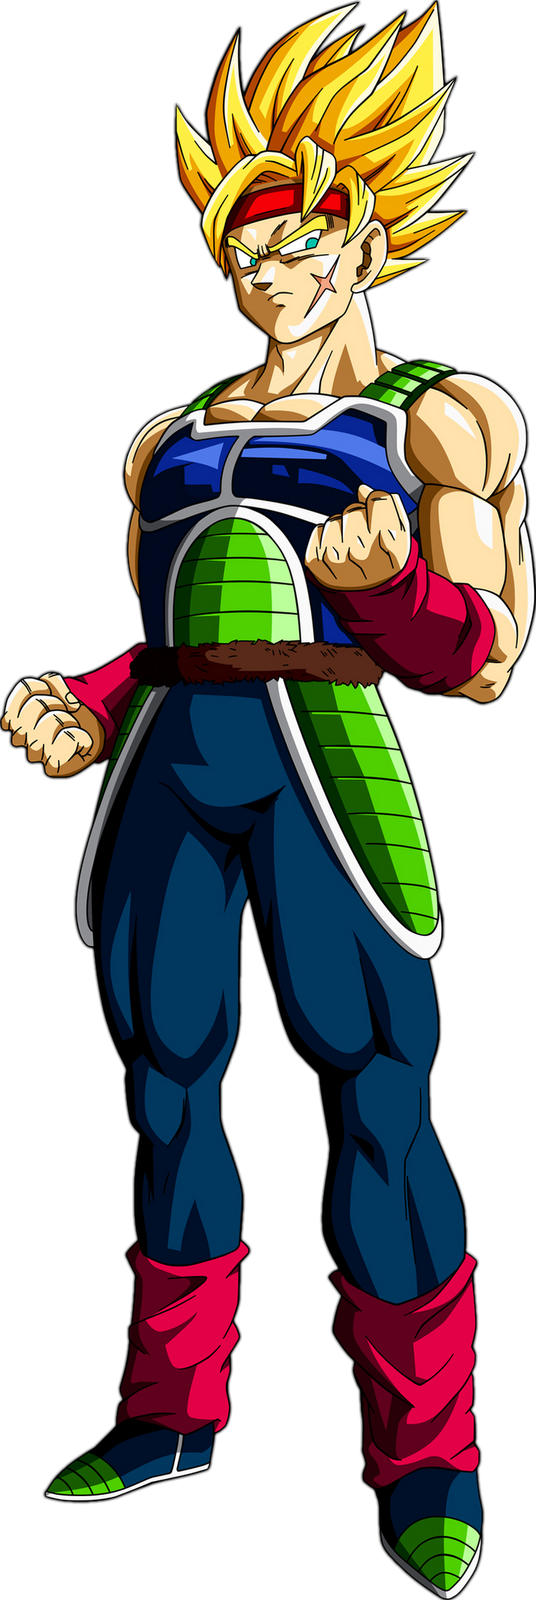 Bardock Ssj Dbz Dragon Ball Z Visit Now For 3d Dragon Ball Z Compression Shirts Now On Sale Dragonball Dbz Dragonballsuper Anime Dragon Ball Dragoes